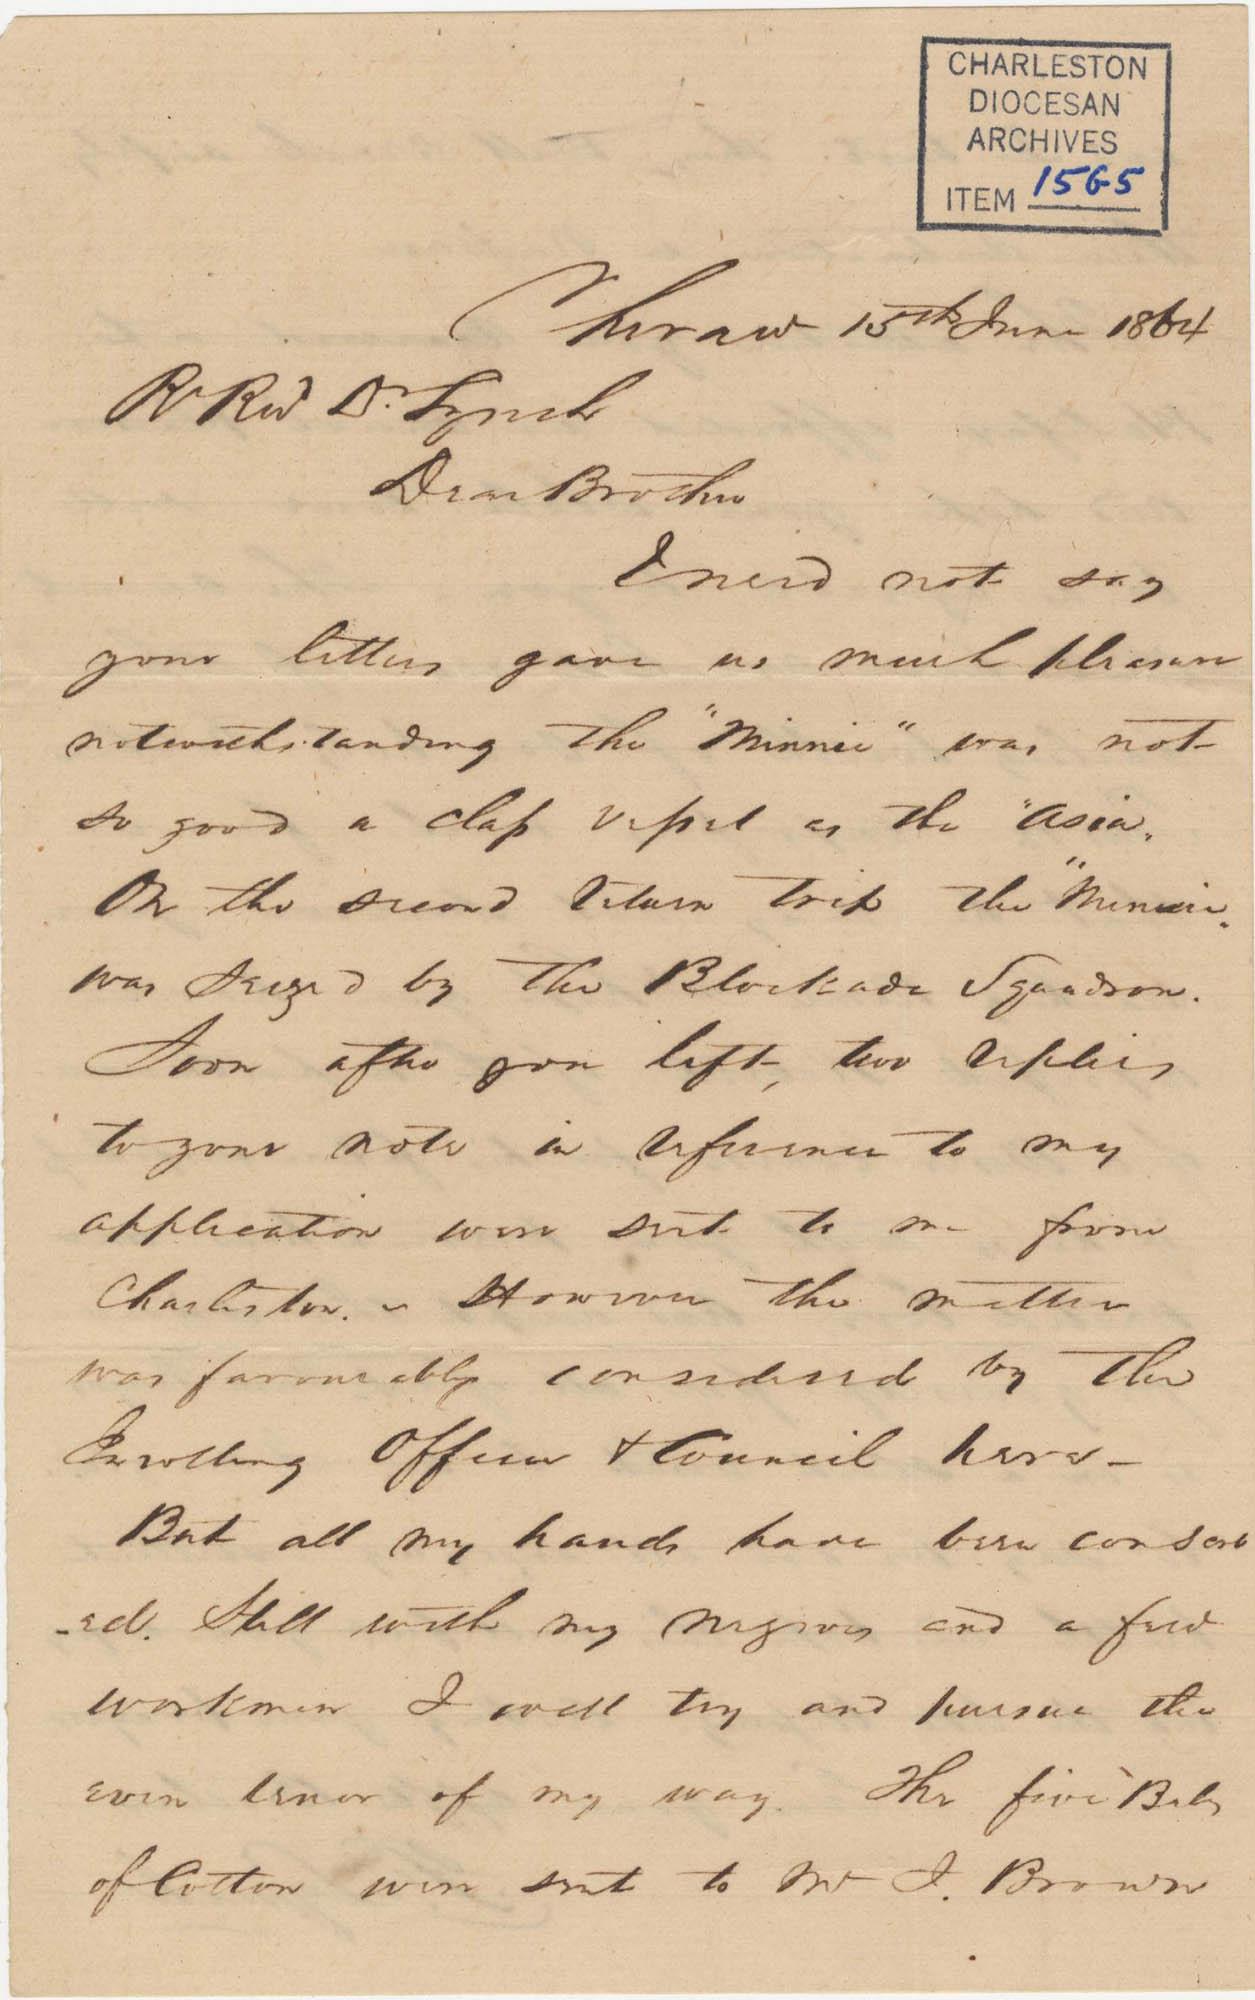 355. Francis Lynch to Bp Patrick Lynch -- June 15, 1864